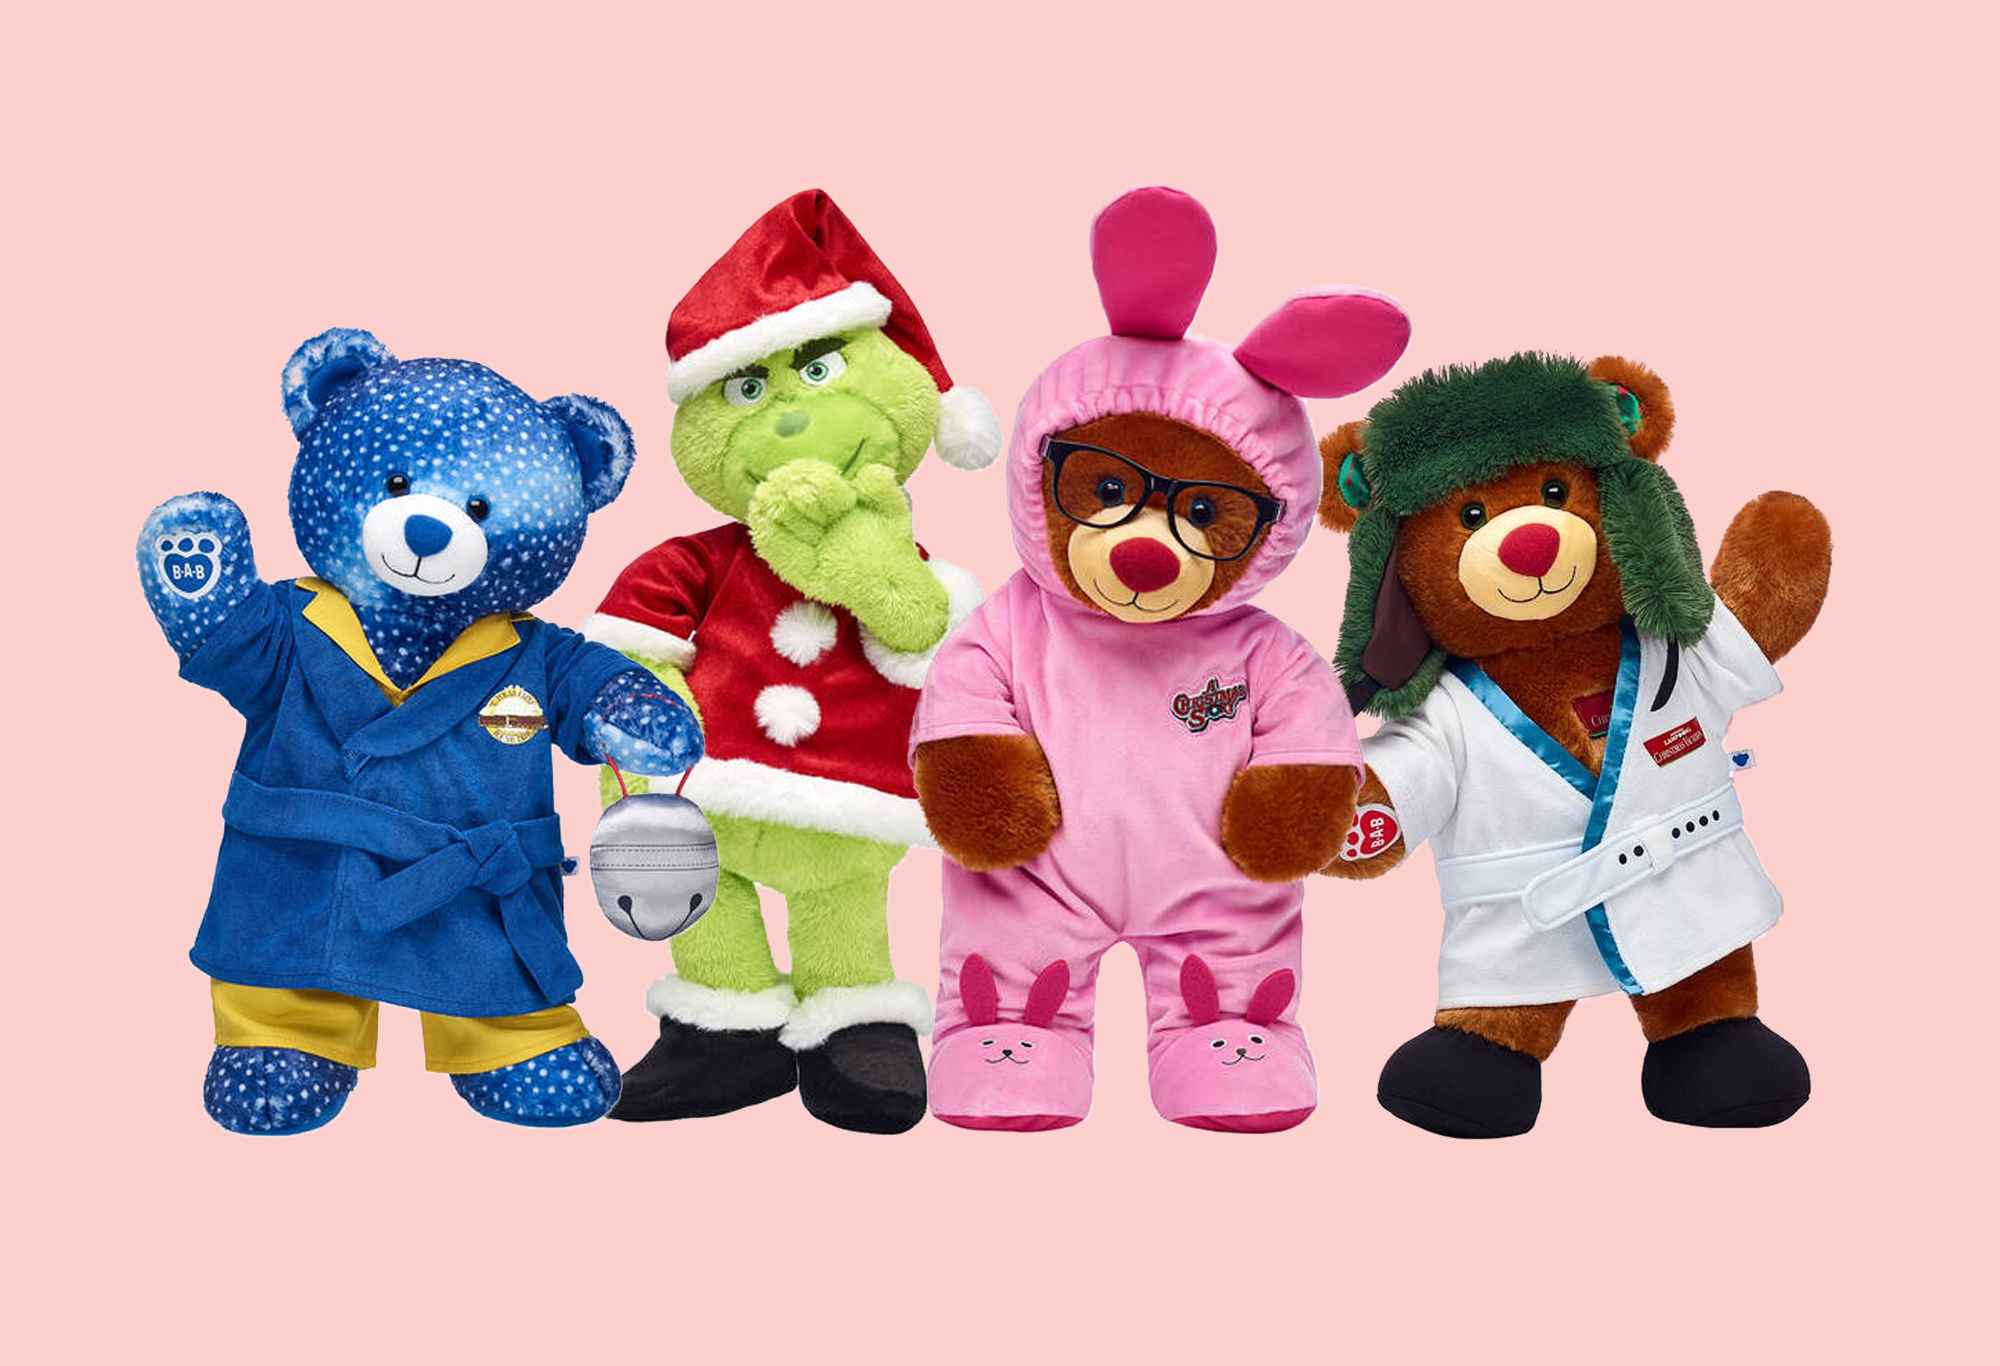 Build A Bear Christmas 2020 Build a Bear Christmas Movie Bears   Cousin Eddie, Ralphie, the